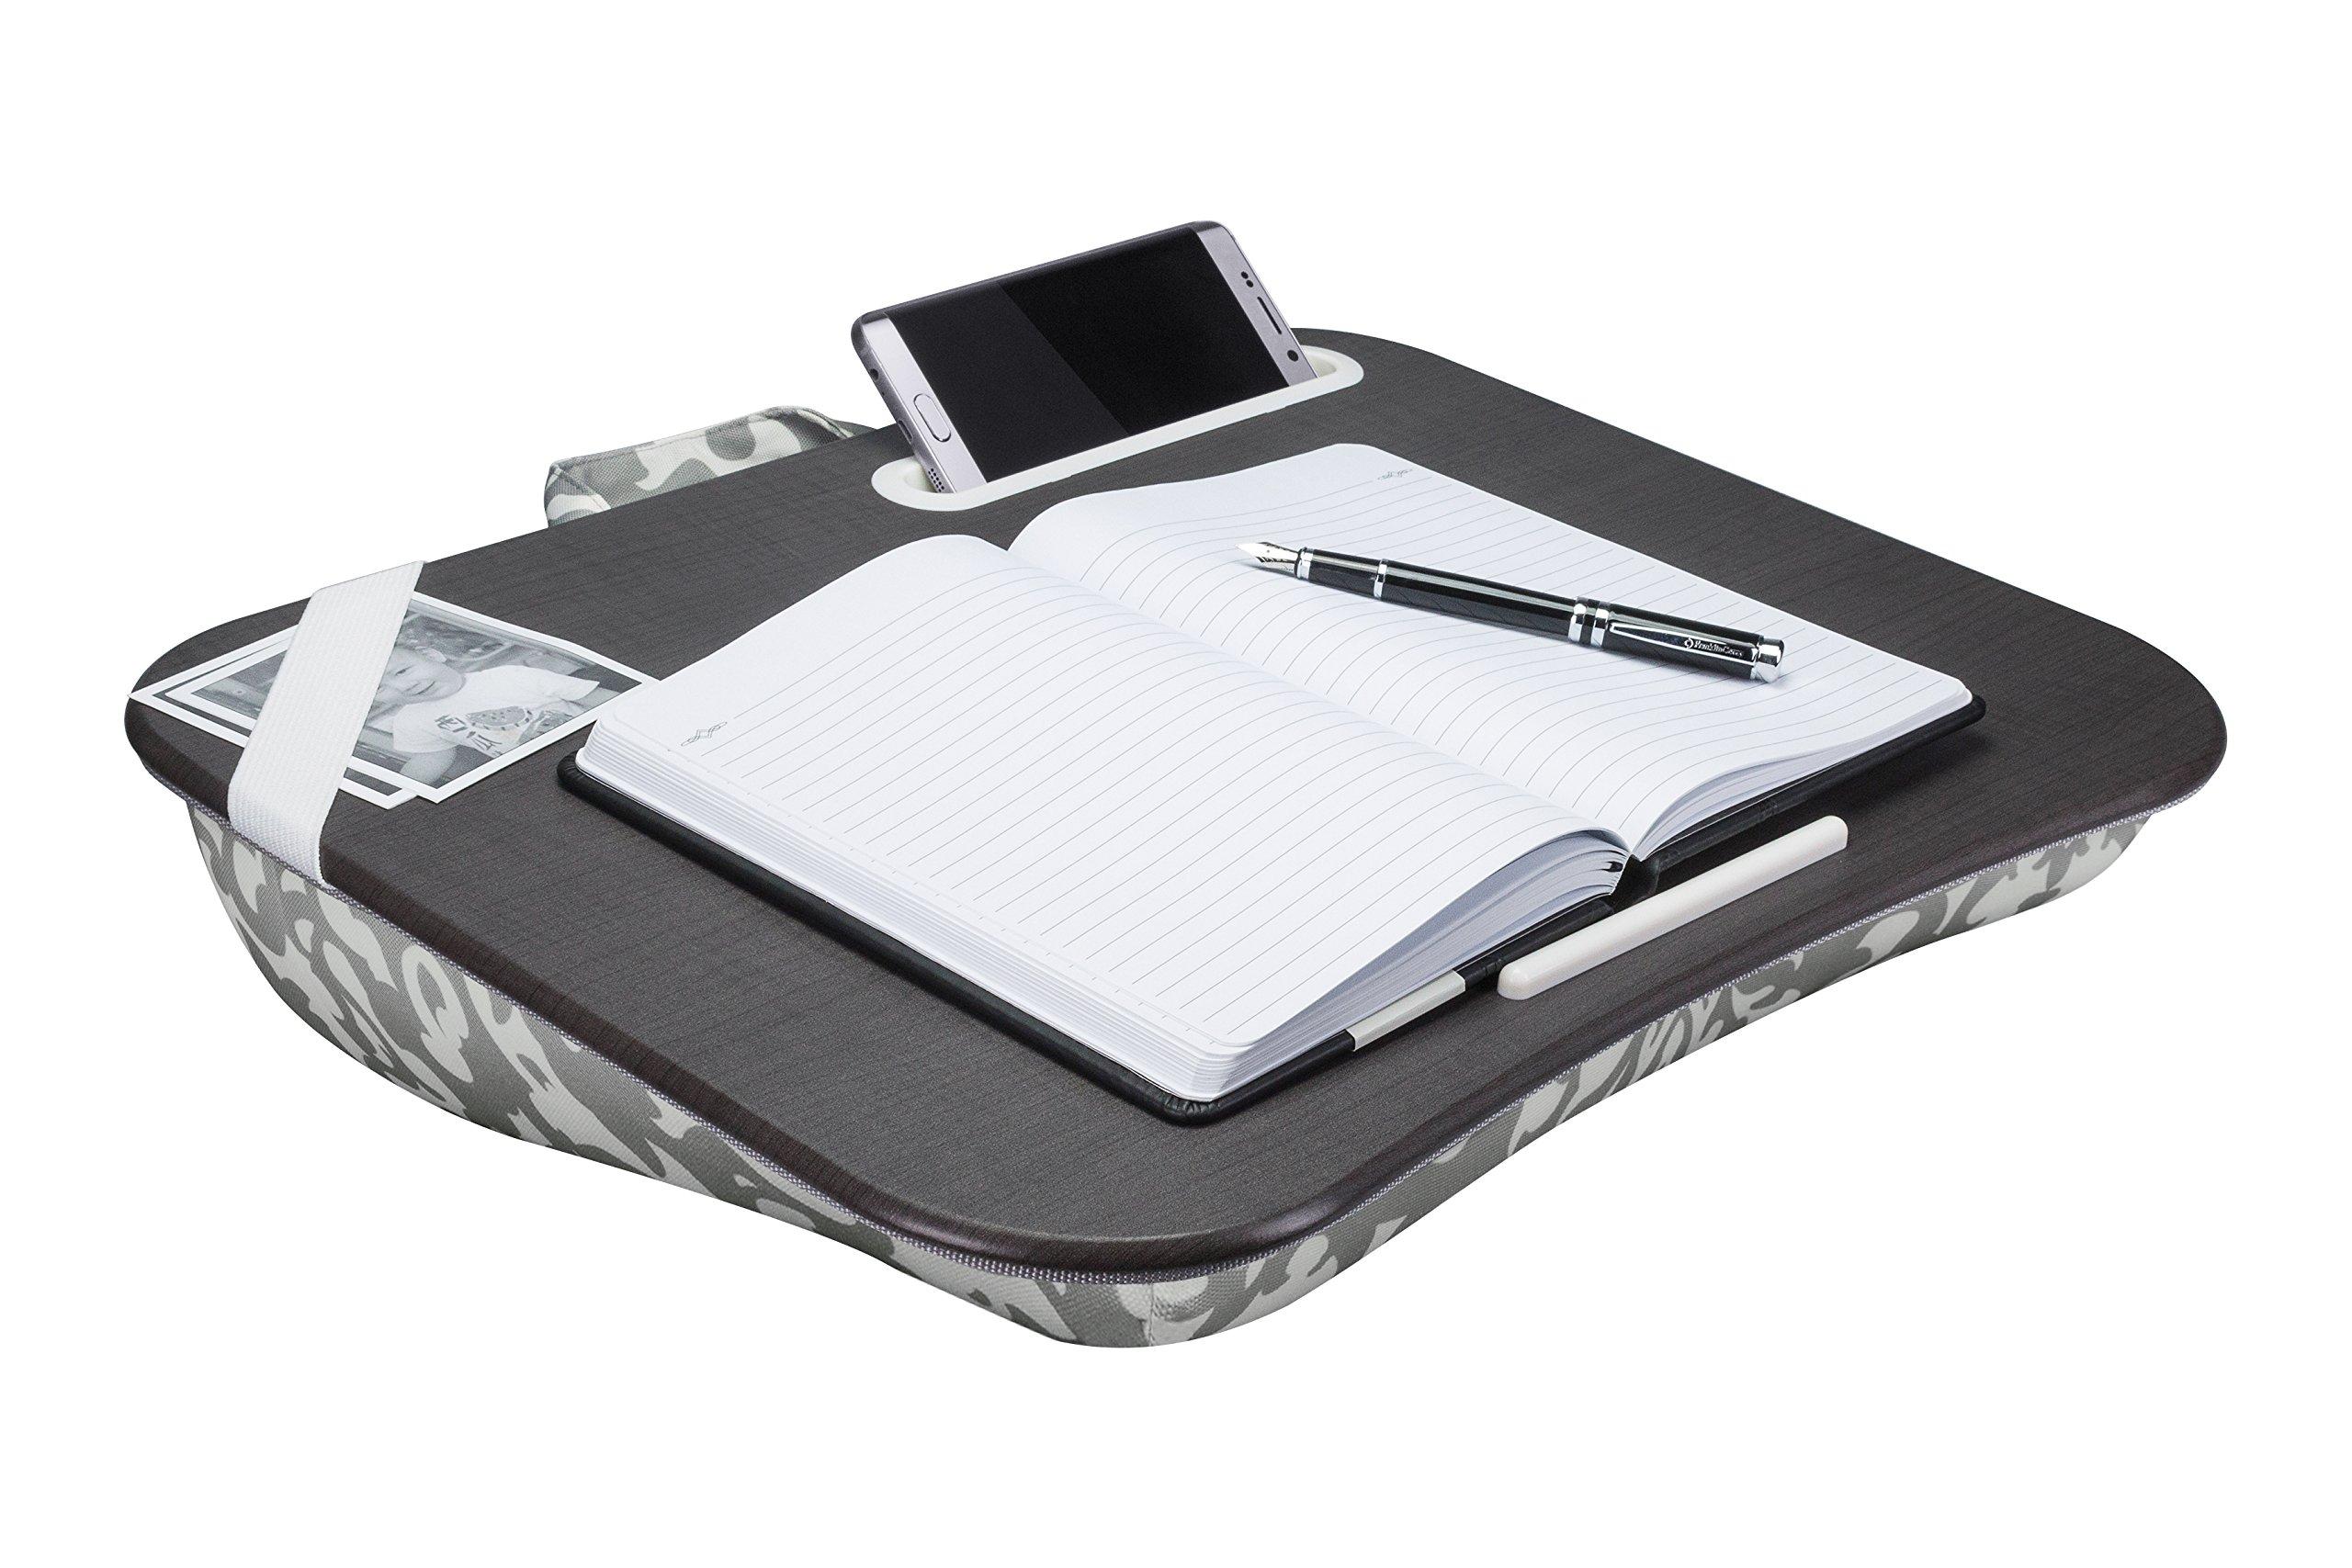 LapGear Designer Lap Desk, Gray Damask (Fits up to 17.3'' Laptop)